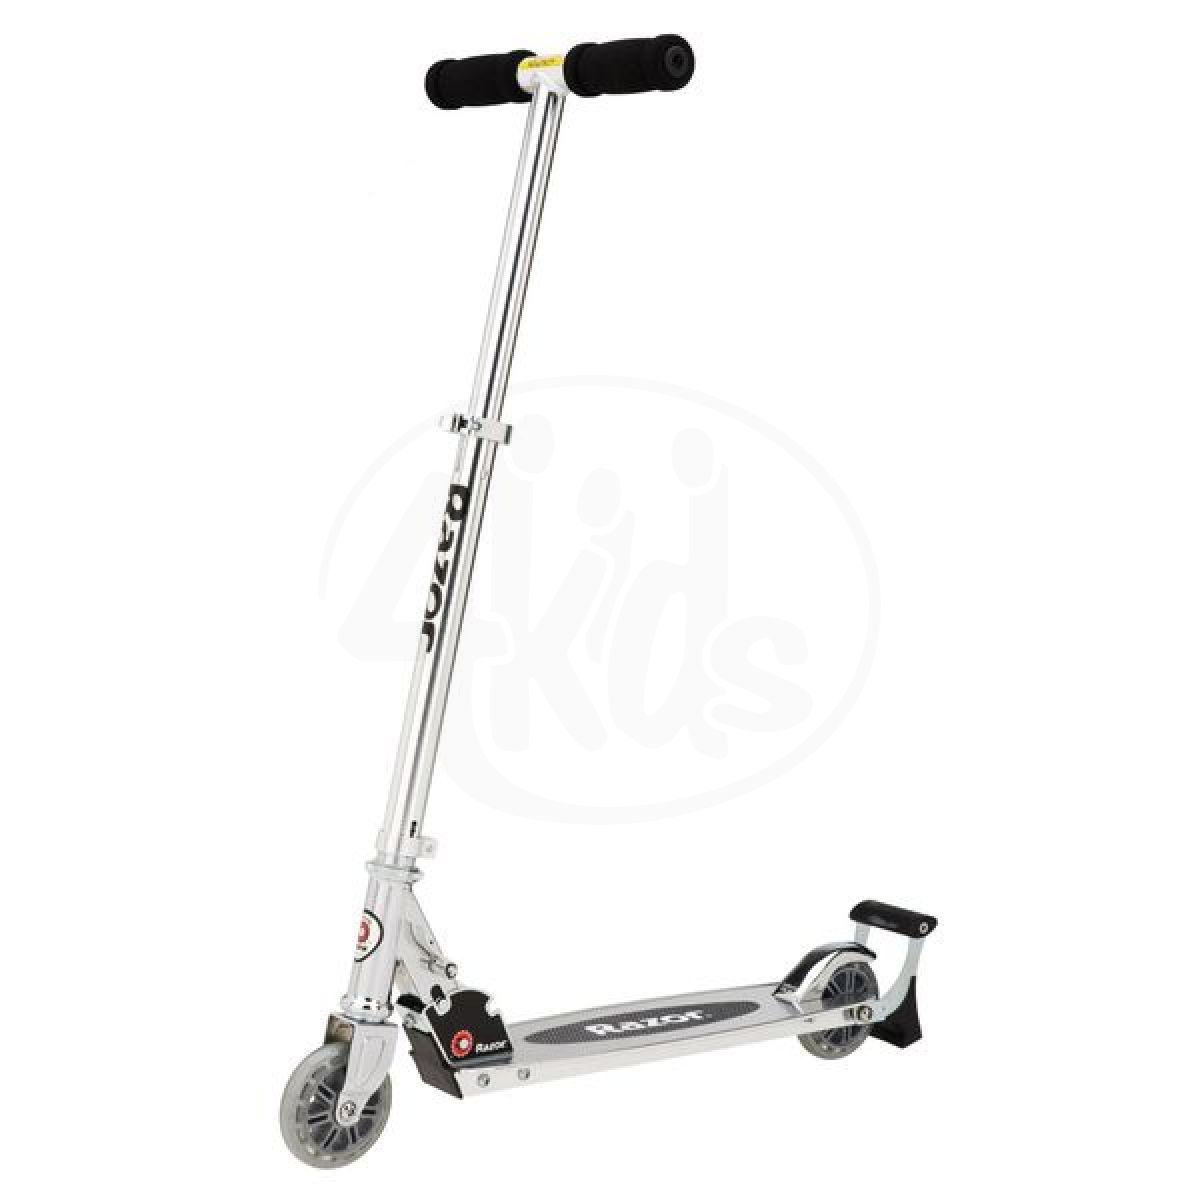 Razor Koloběžka Spark Scooter w 125mm wheels Clear EU